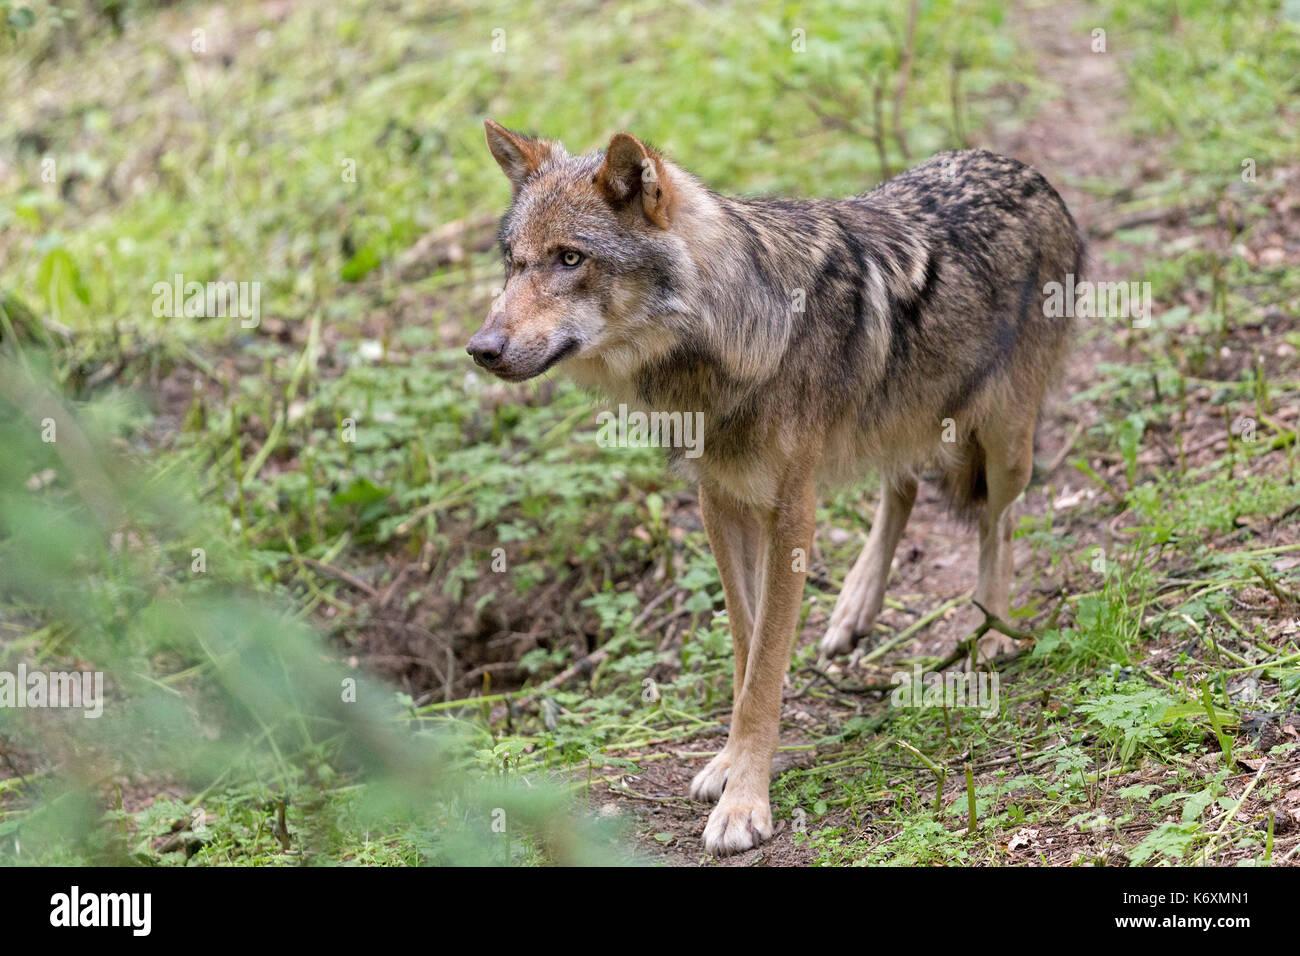 wolf (Canis lupus), Wildpark Schwarze Berge, Rosengarten, Lower Saxony, Germany - Stock Image